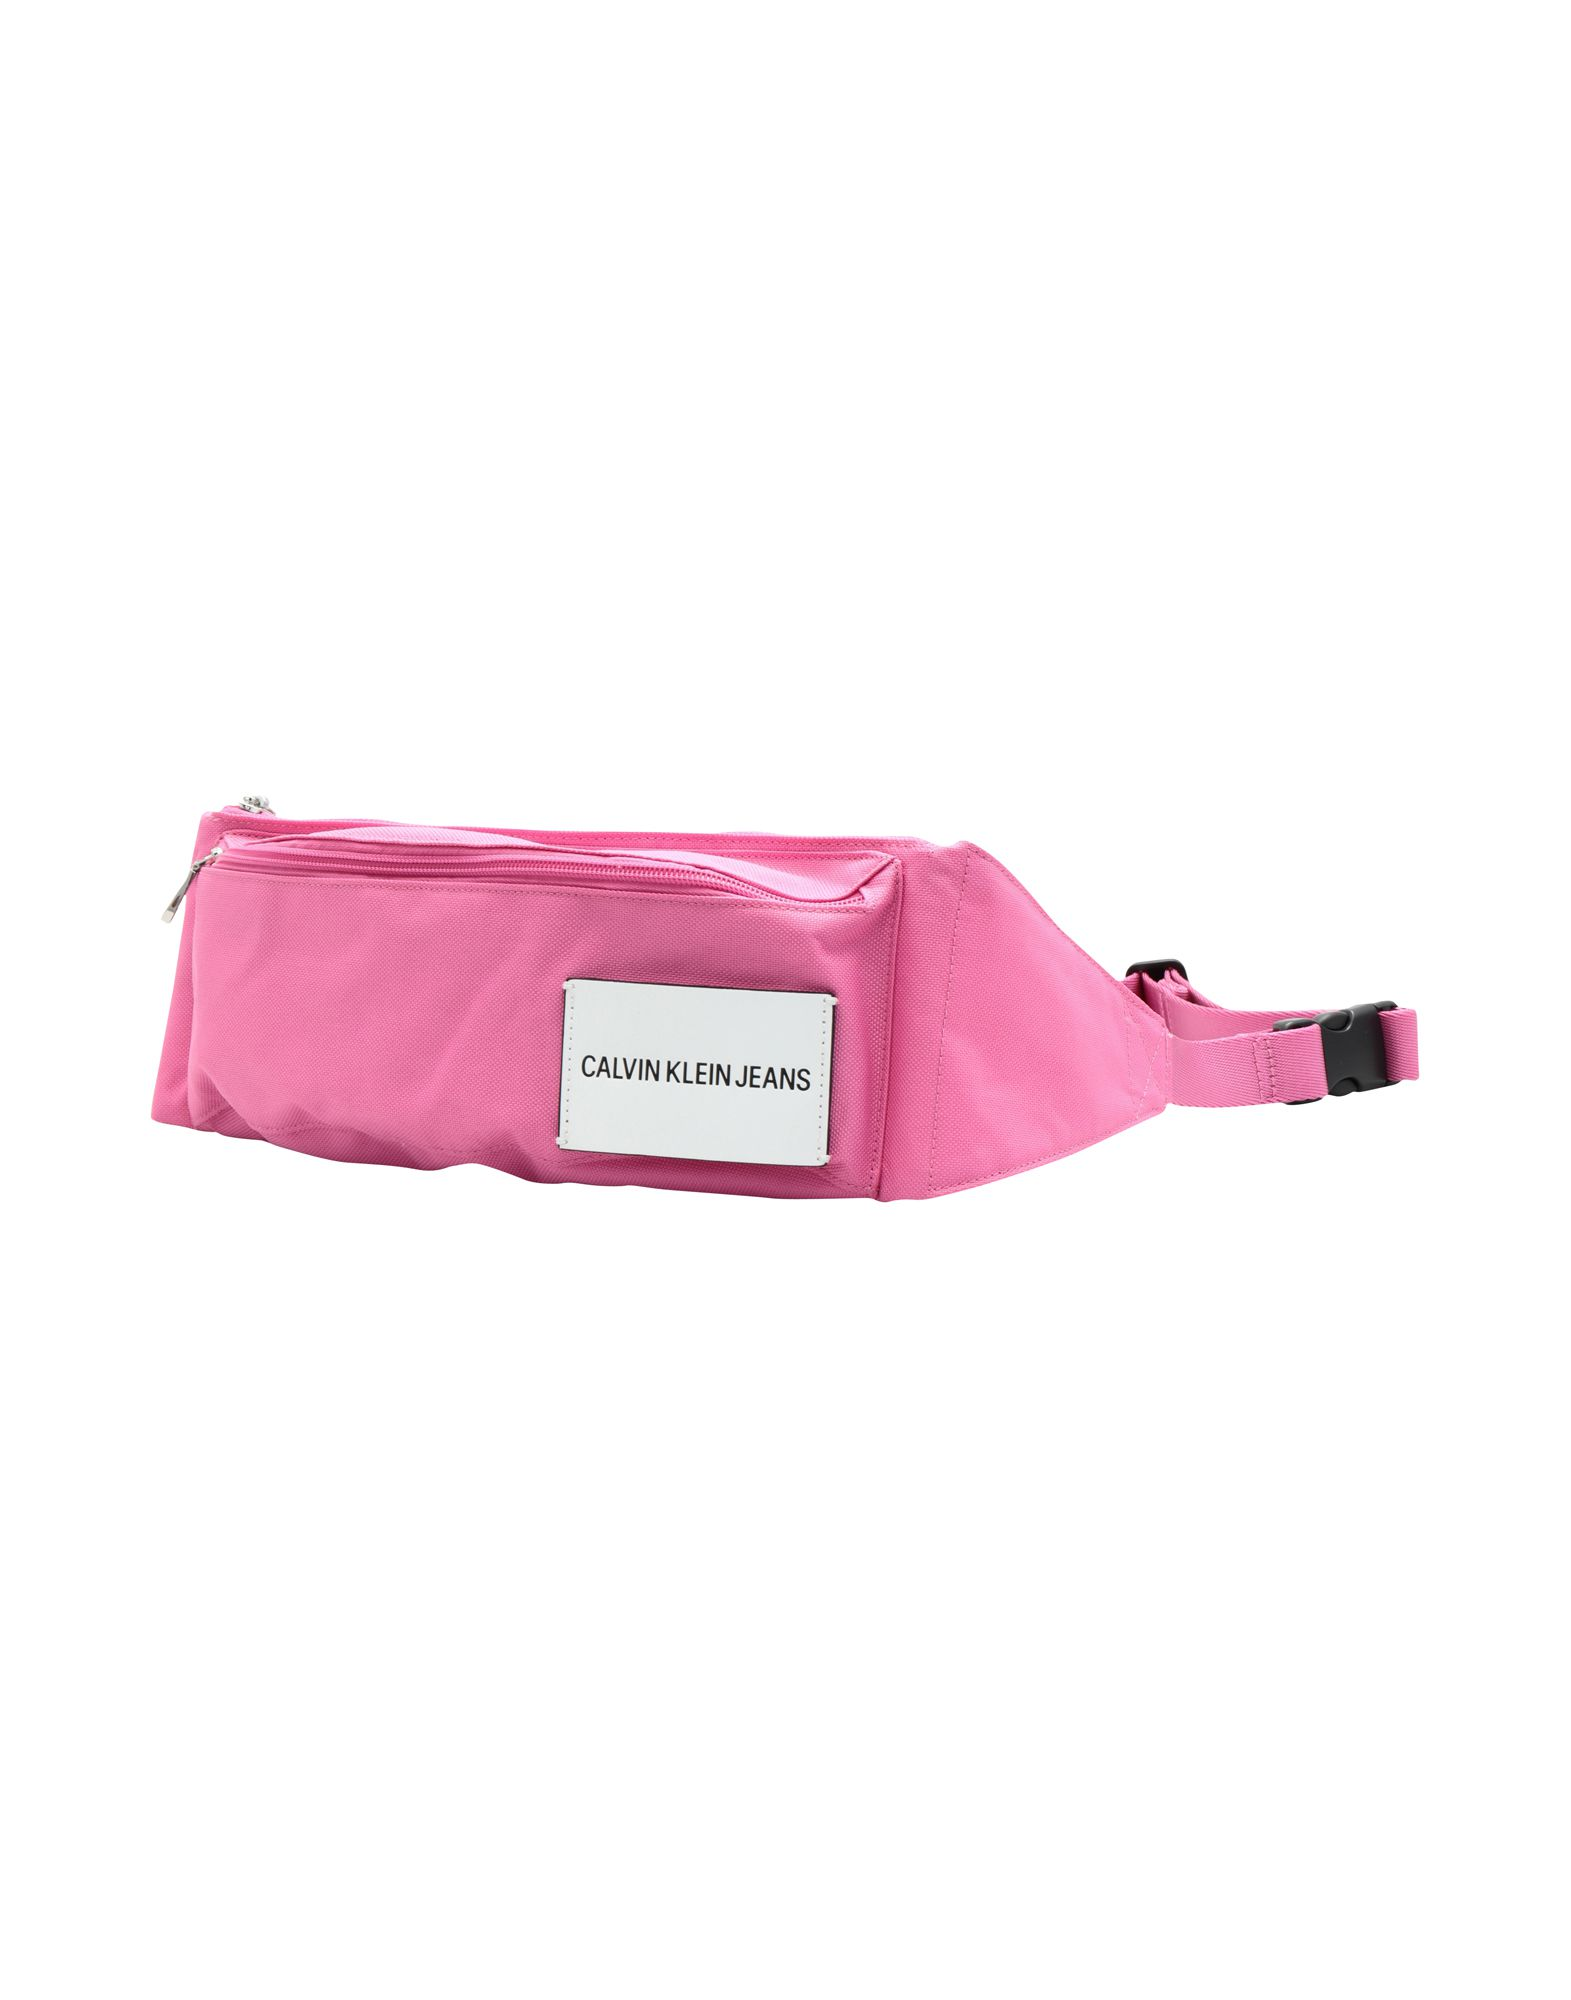 купить CALVIN KLEIN JEANS Рюкзаки и сумки на пояс по цене 5450 рублей